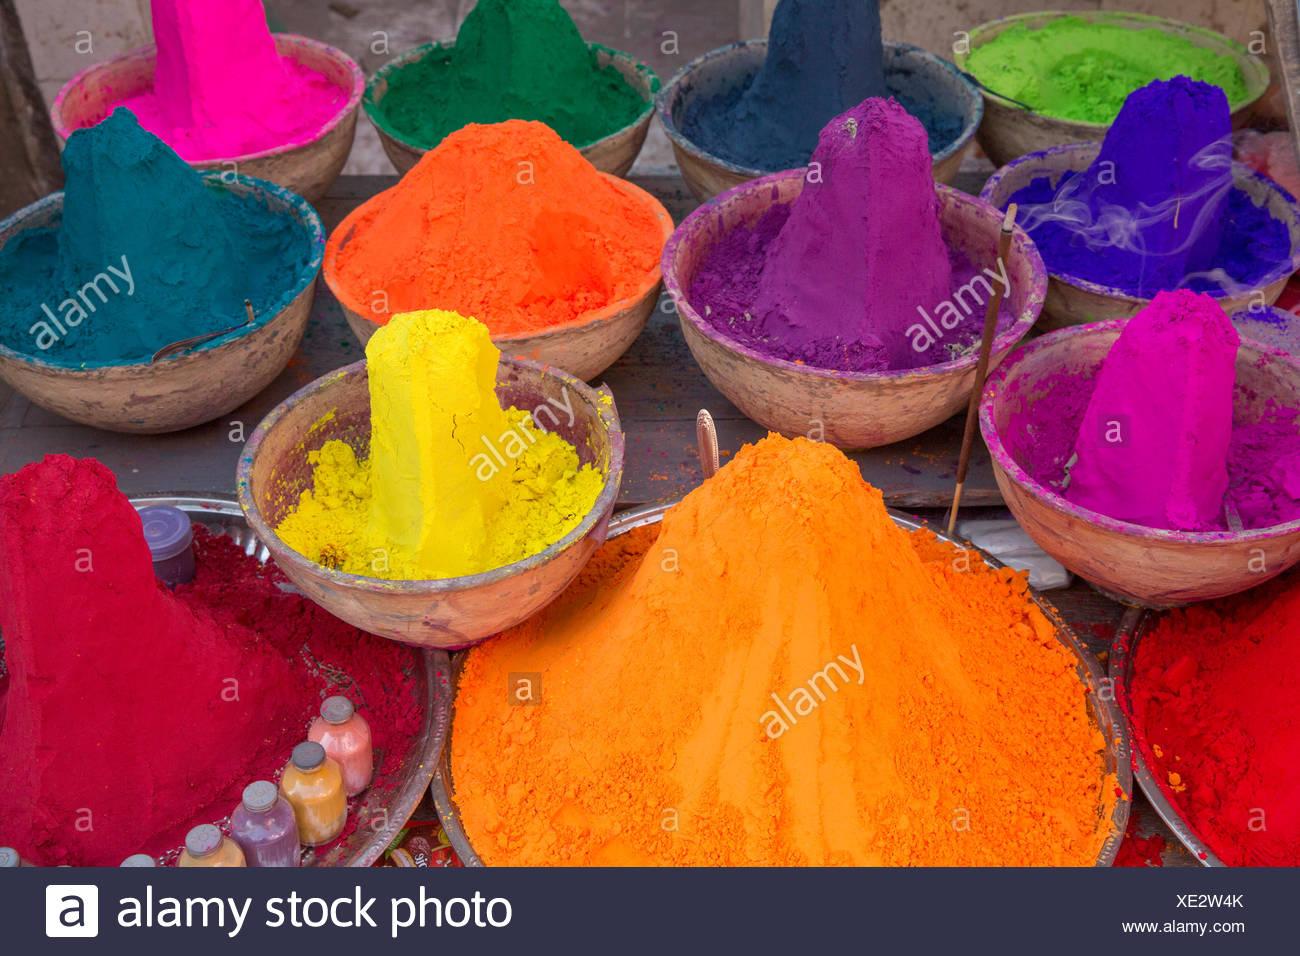 Market, Pushkar, Rajasthan, Asia, India, spices, colorful, Food - Stock Image